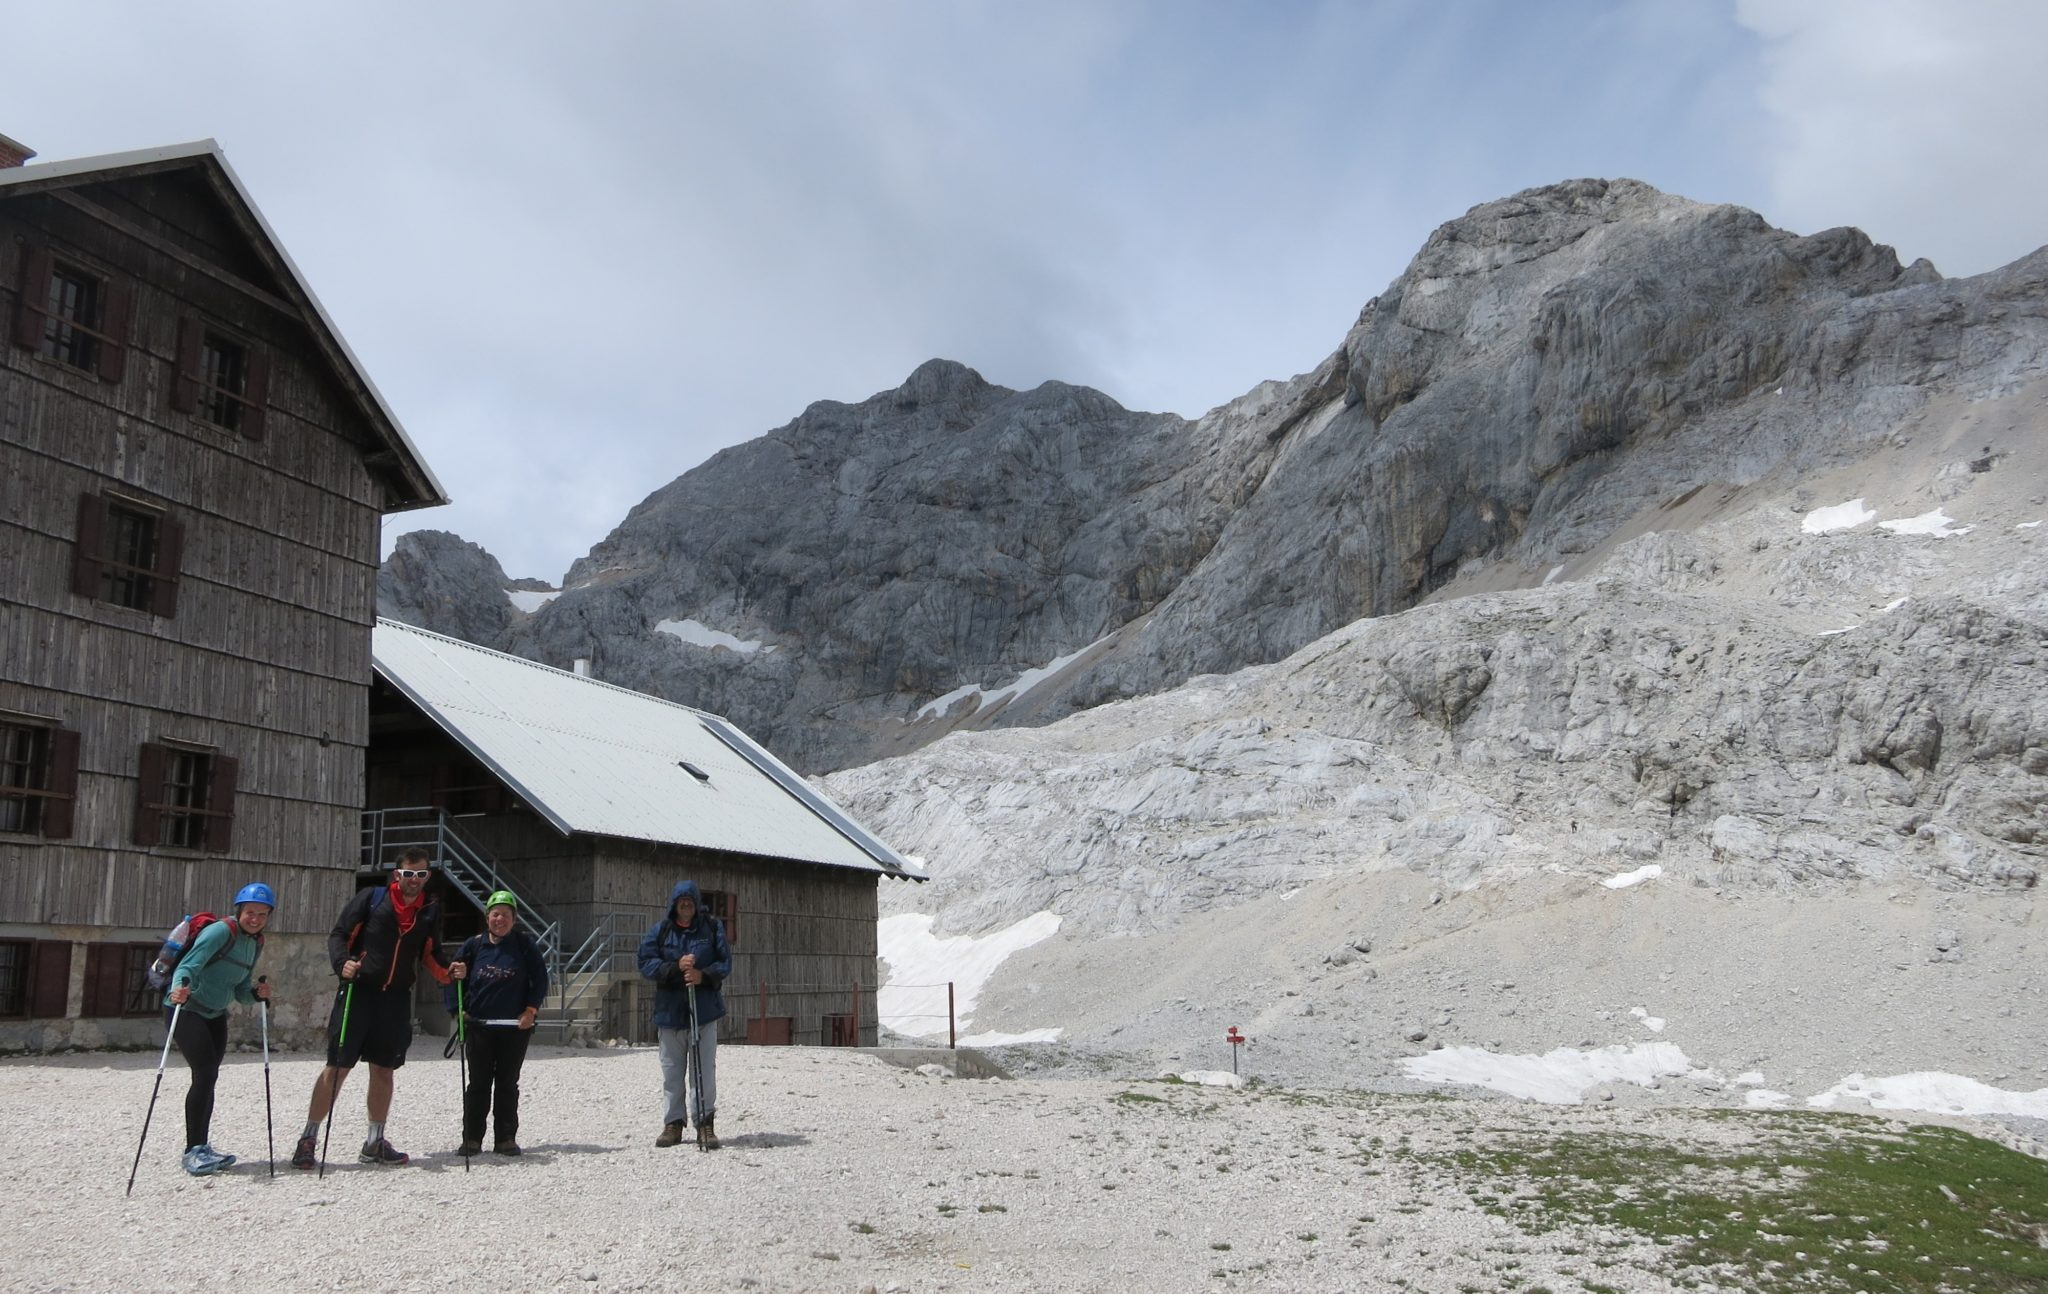 At the Planika mountain hut